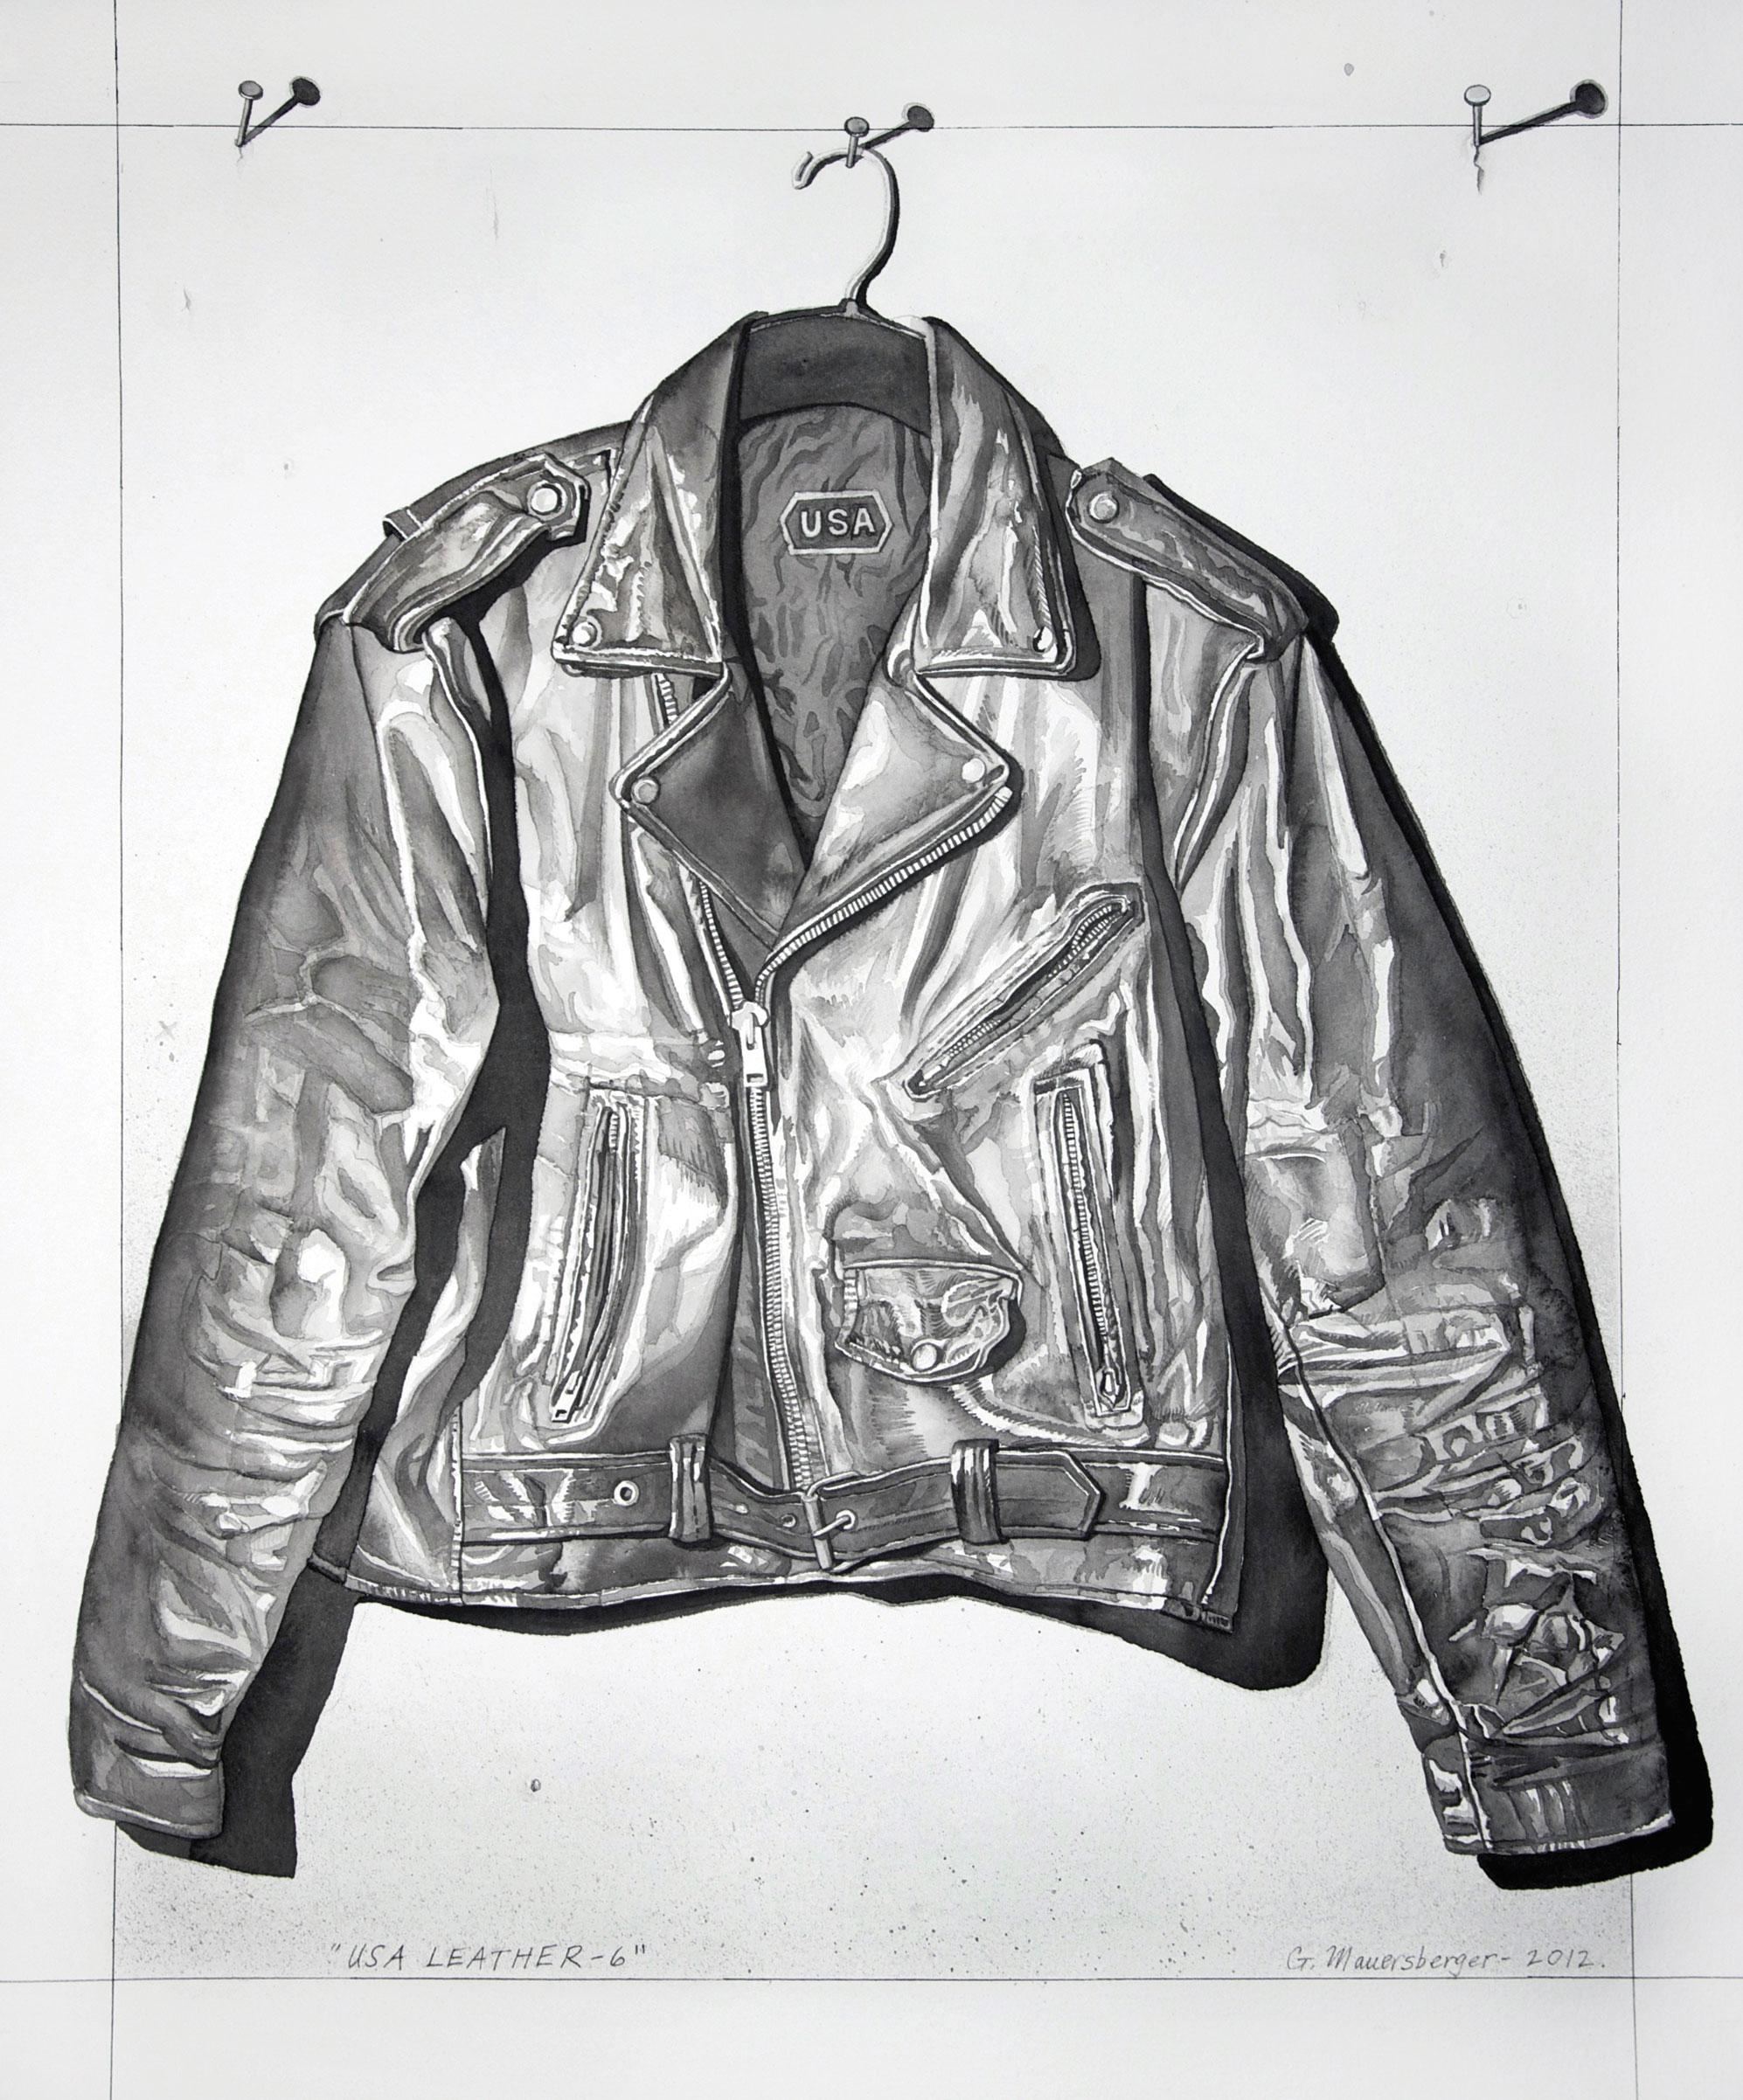 USA Leather 6